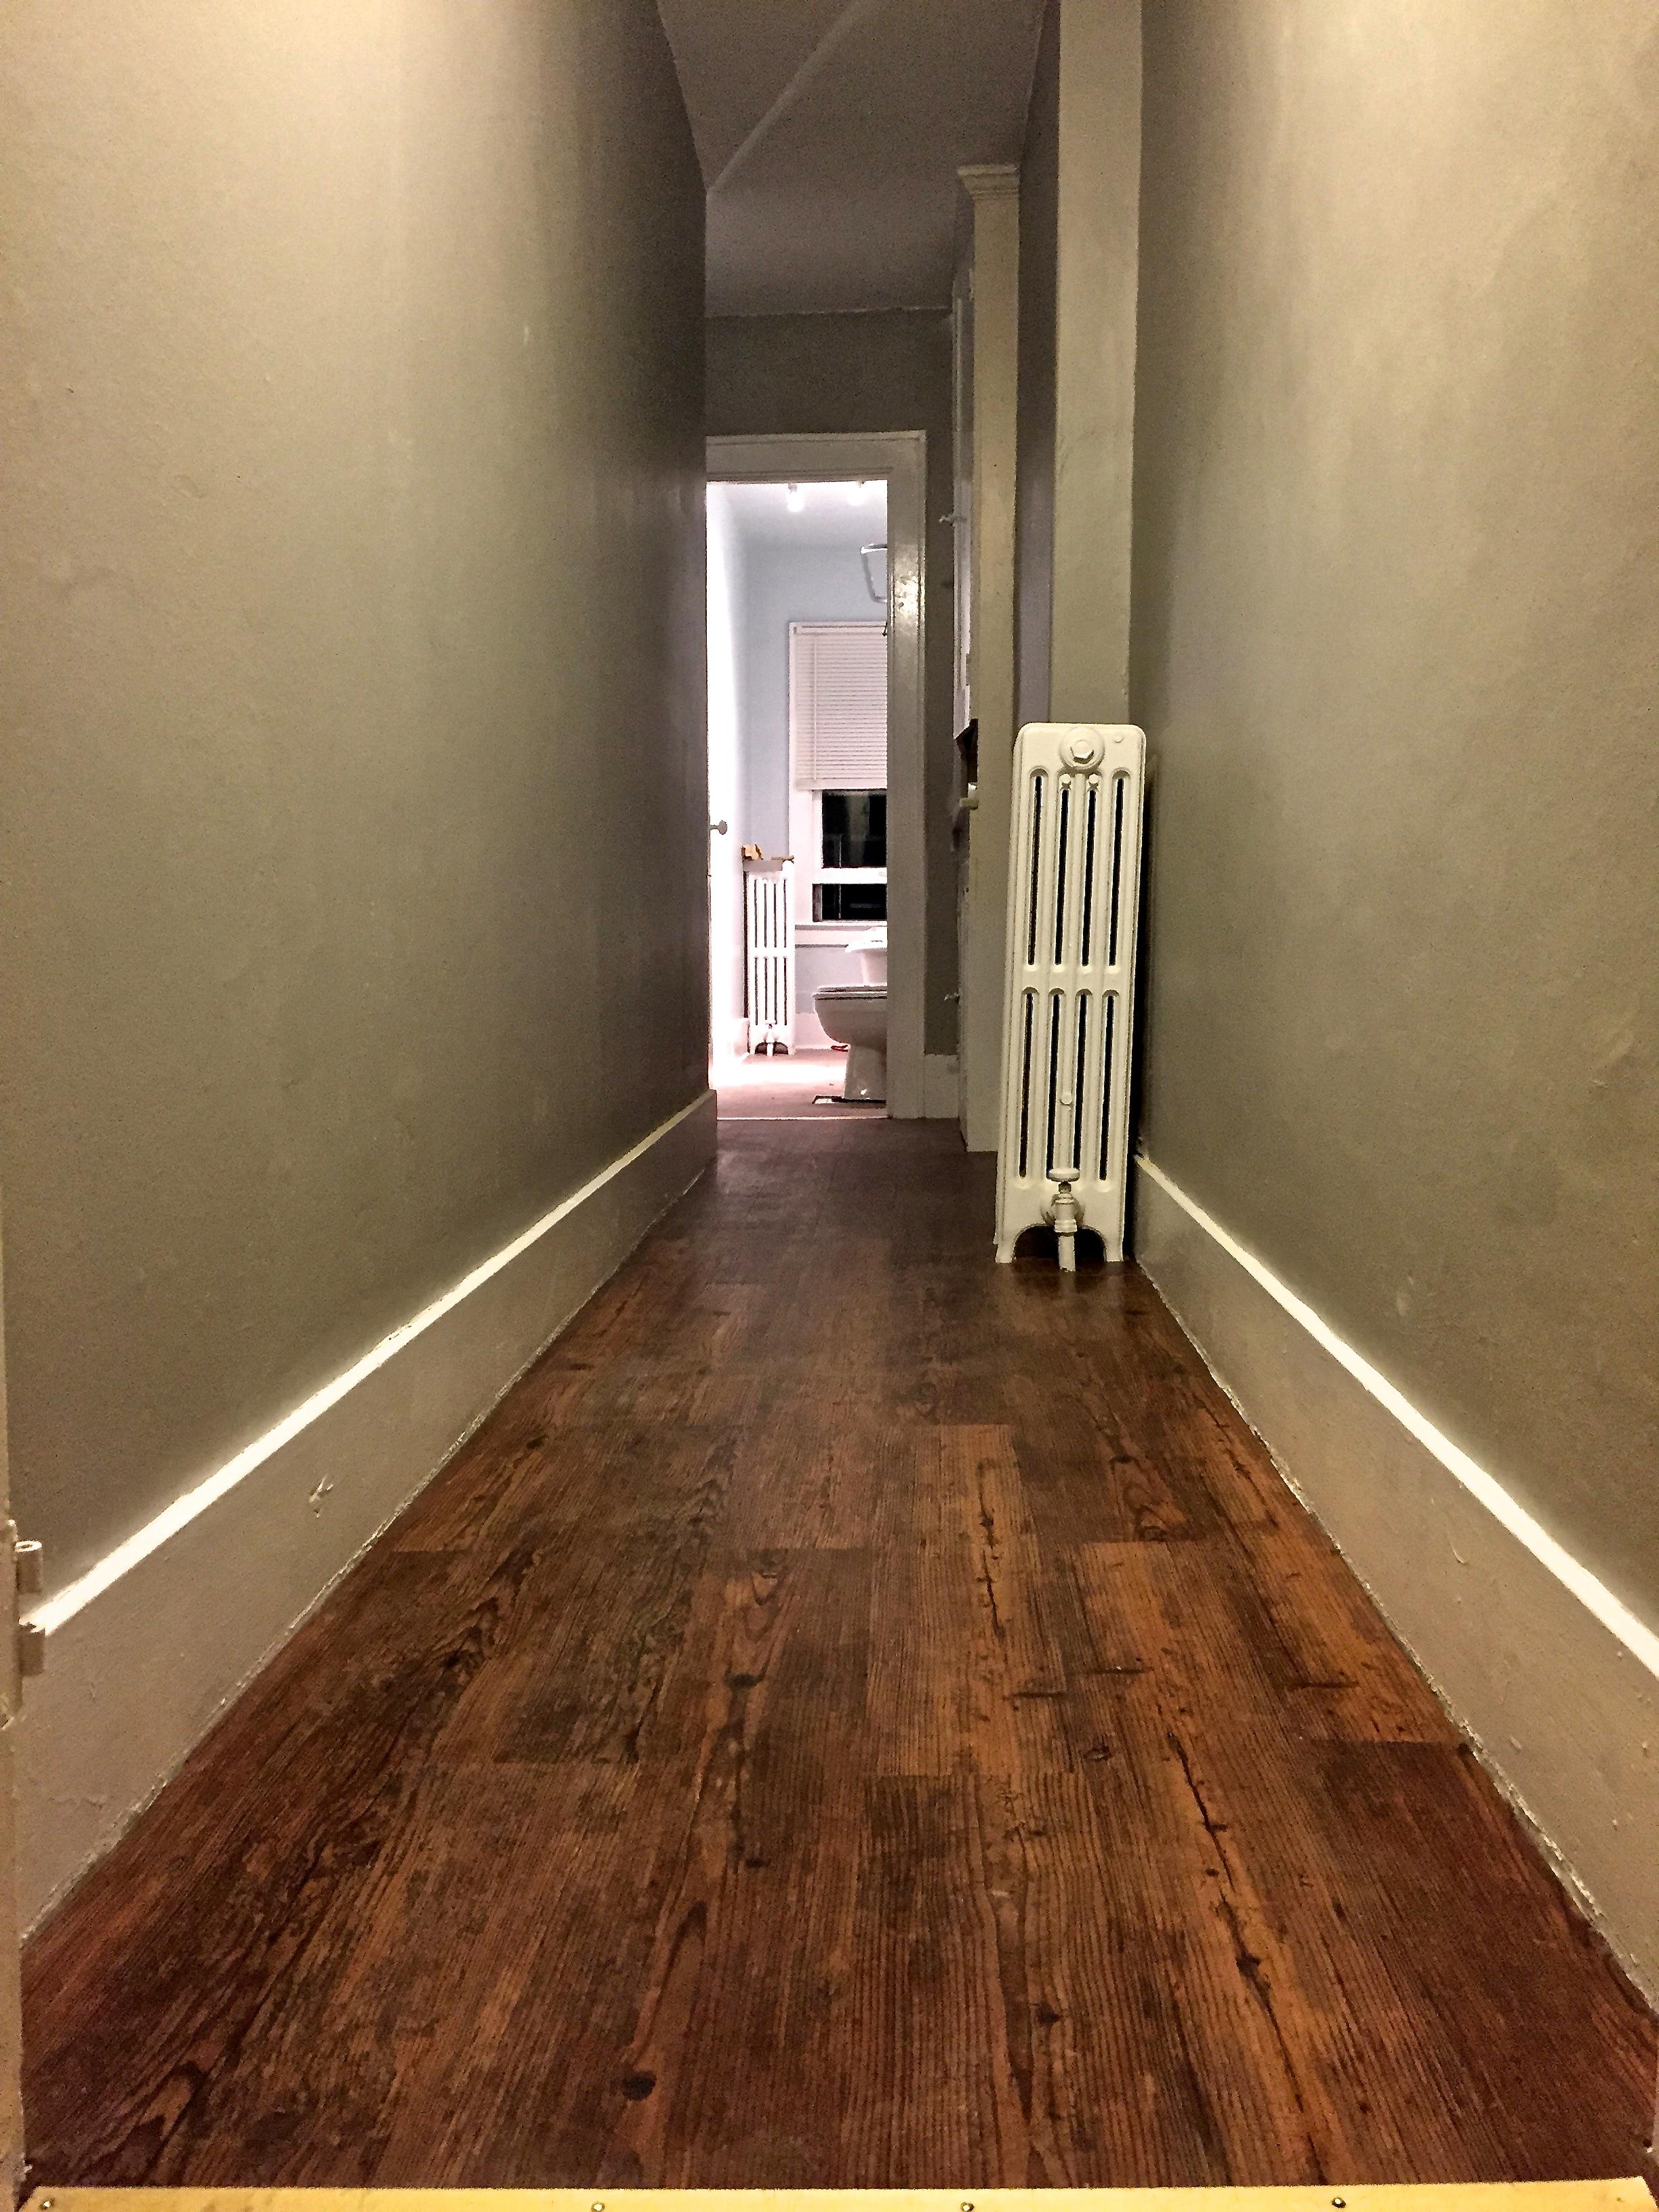 39 Thayer St - #3 - hallway.jpg